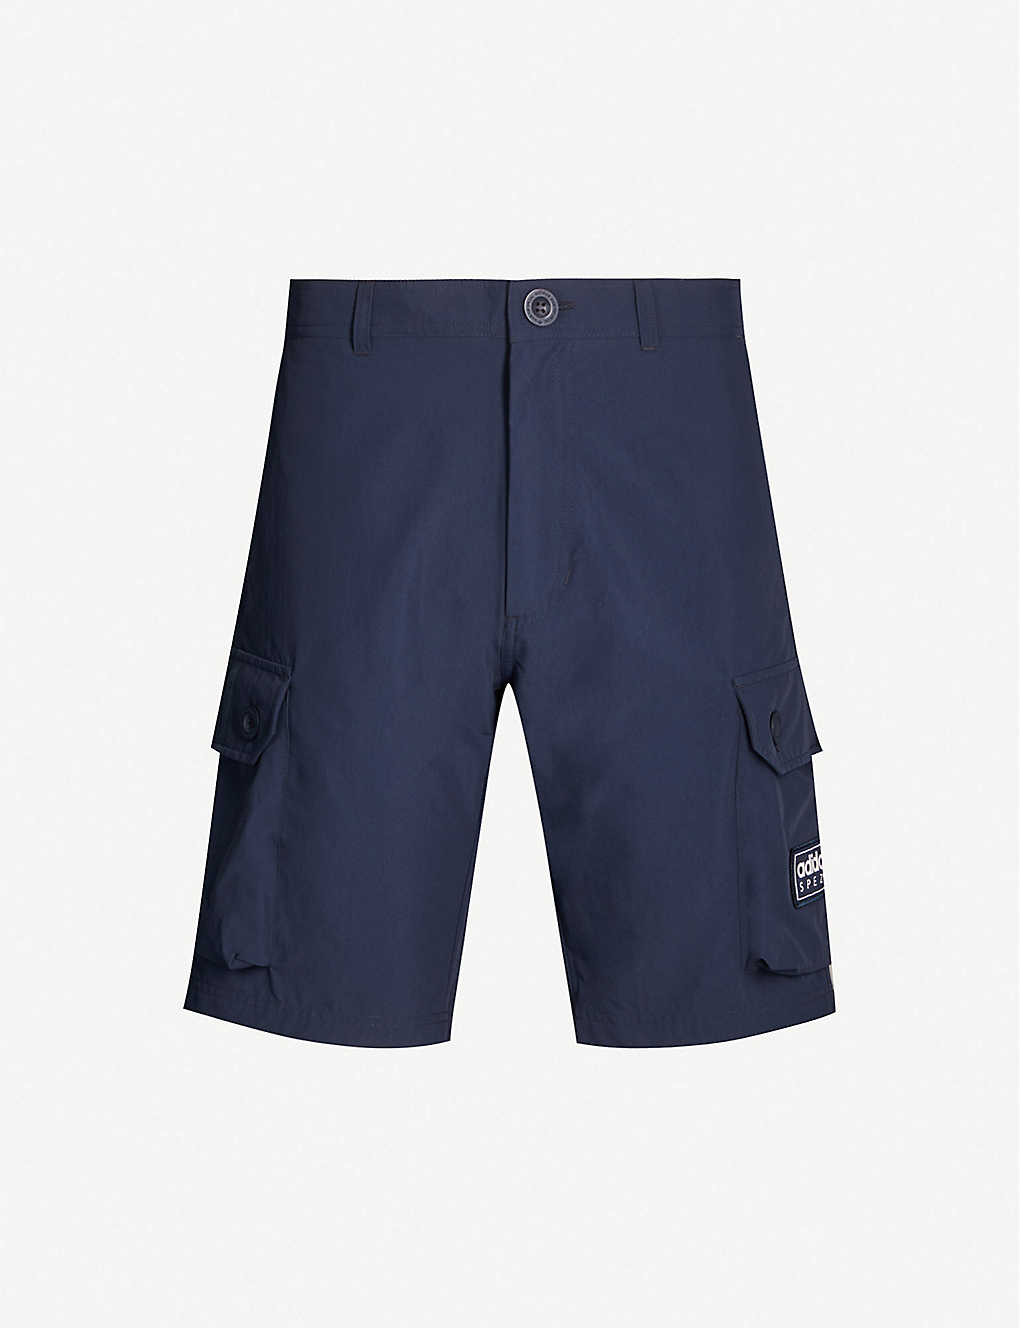 Adidas Pants SPEZIAL Aldwych shell cargo shorts